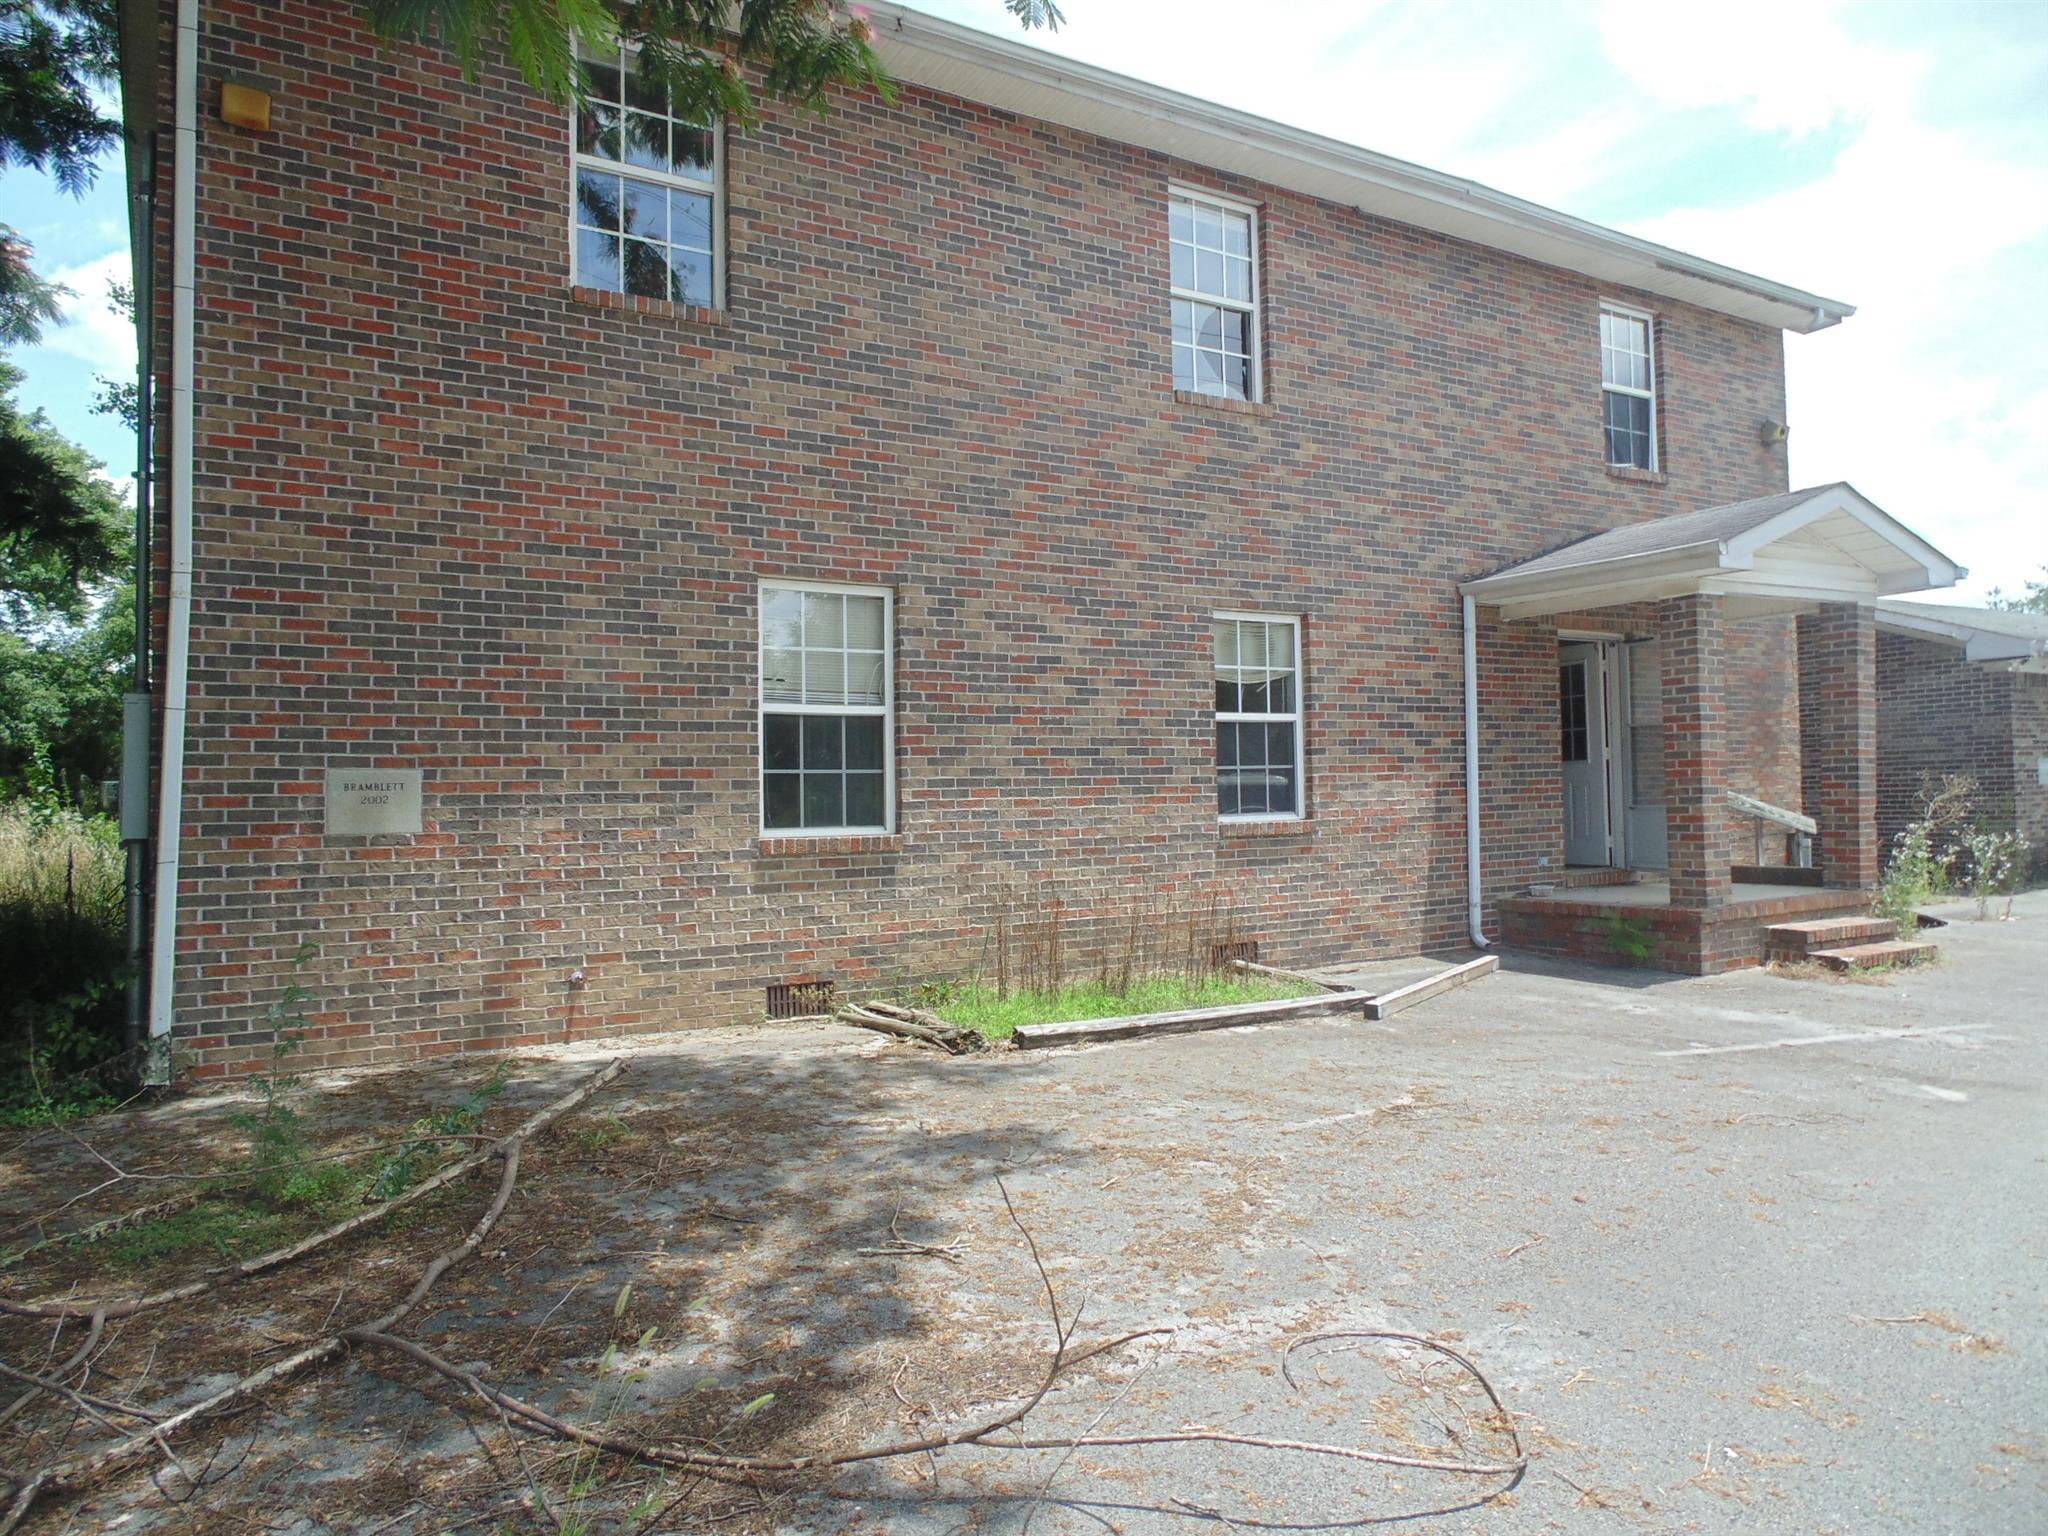 8003 Hillsboro, Hillsboro, TN 37342 - Hillsboro, TN real estate listing